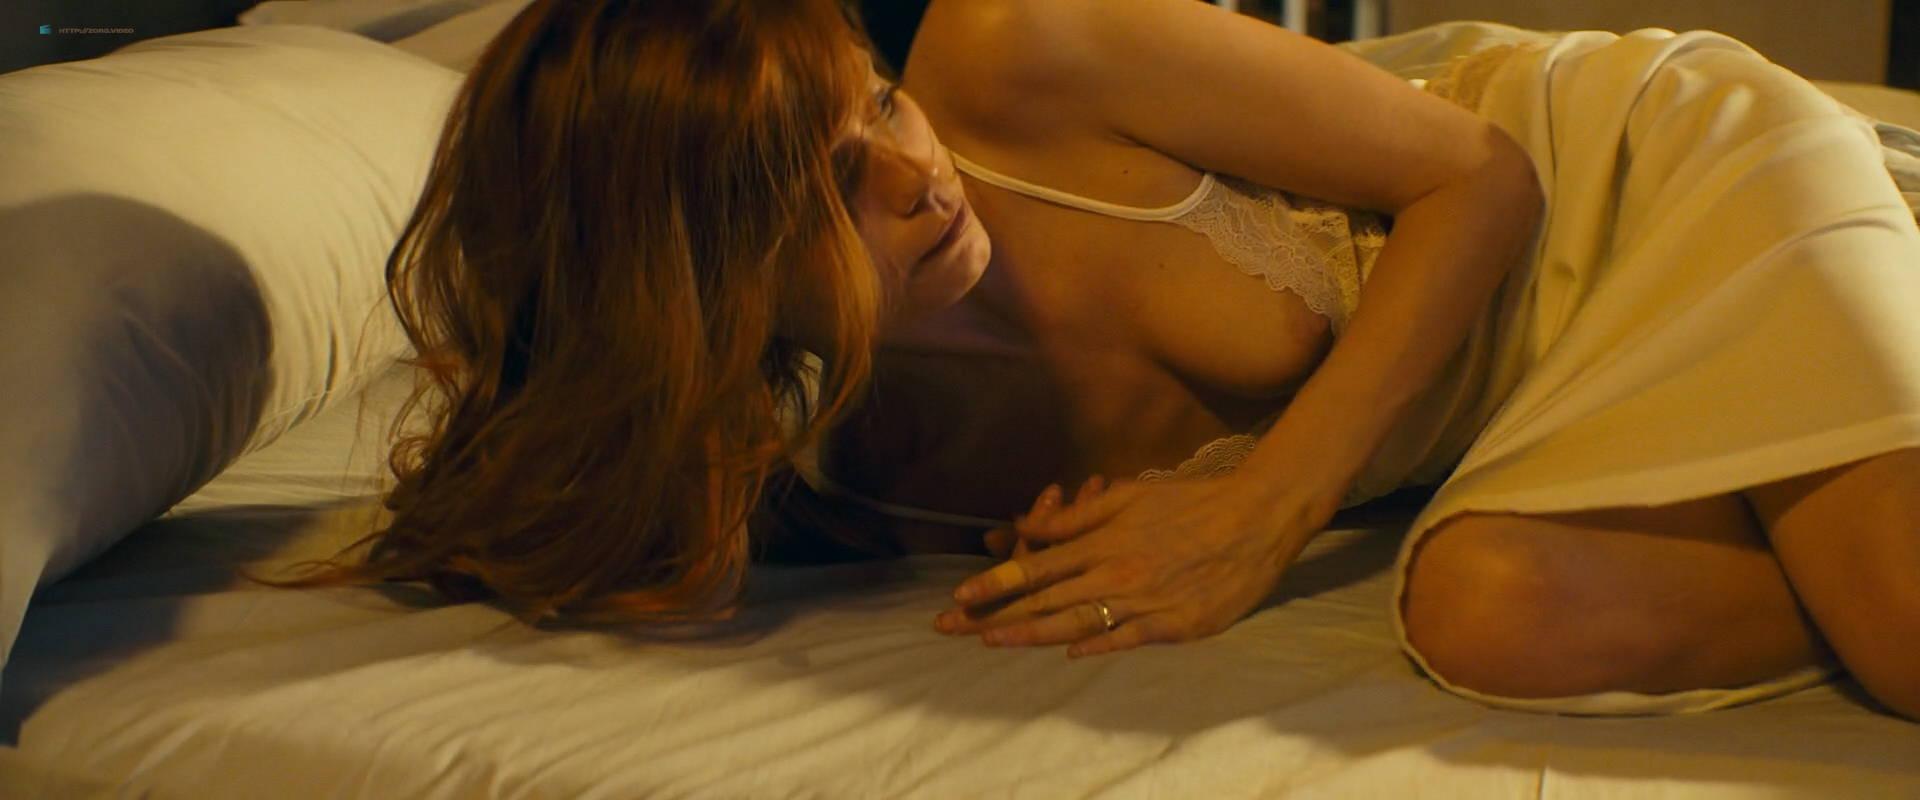 Abbey Lee nude bush and topless Carla Gugino nude butt - Elizabeth Harvest (2018) HD 1080p Web (14)